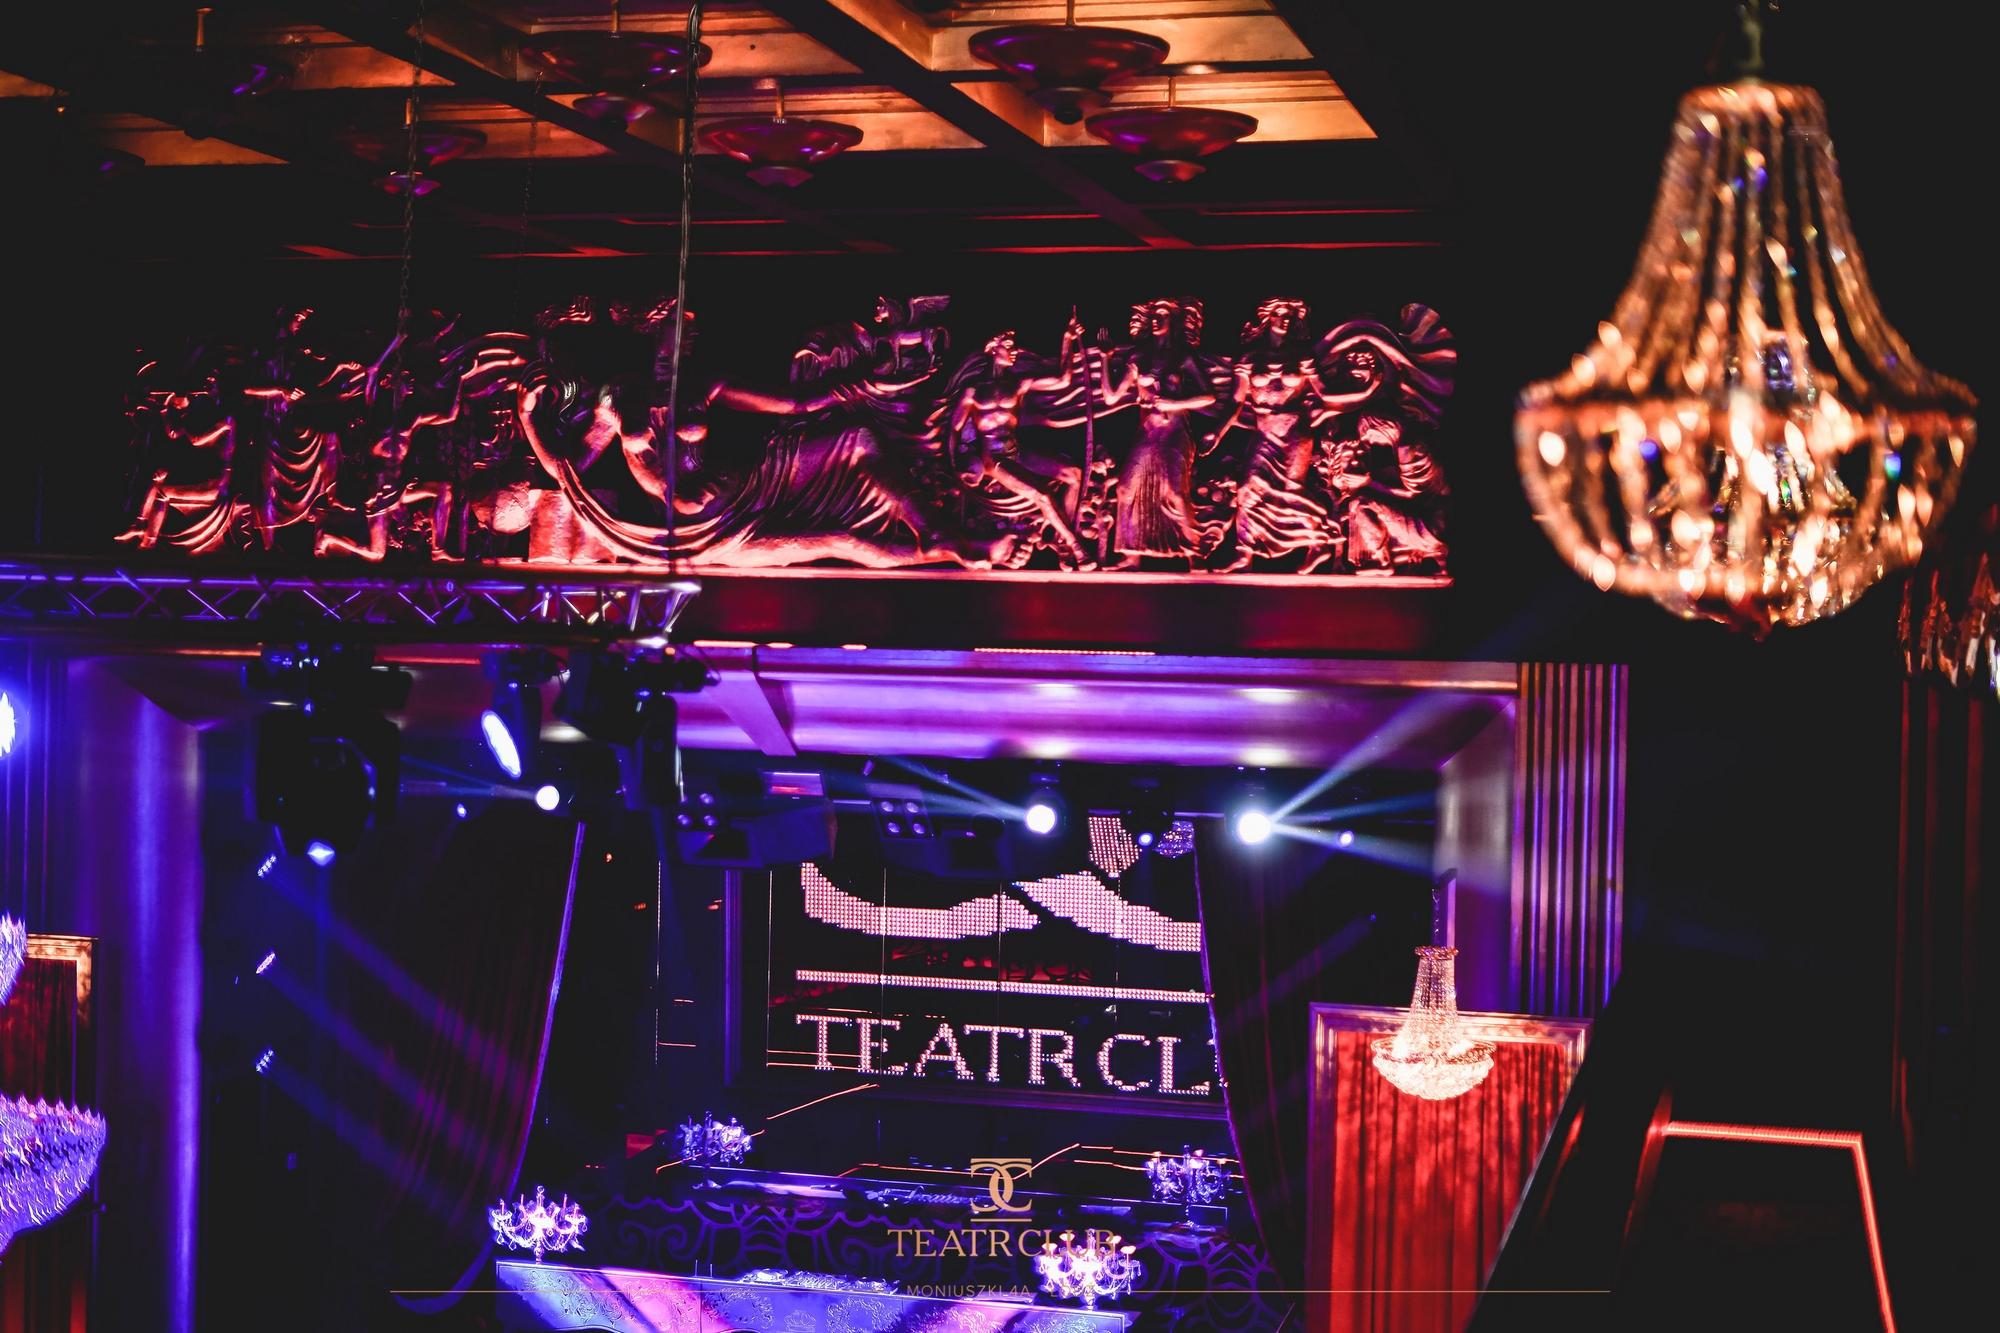 teatr_gallery10